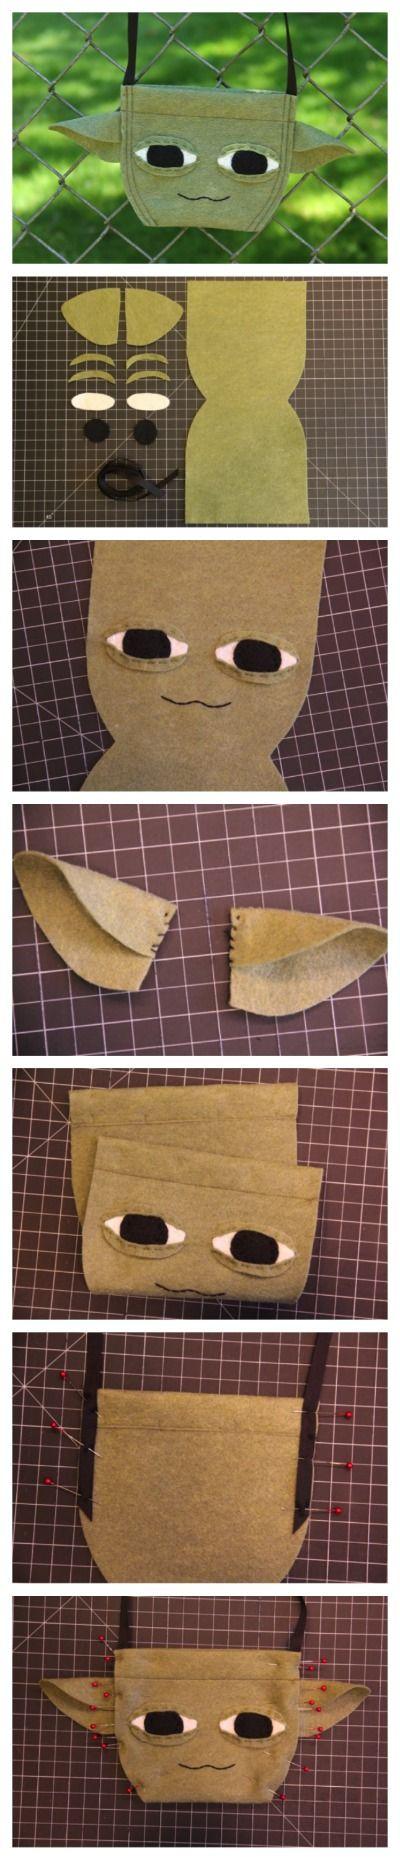 Disney Craft: A Star Wars Weekends-Inspired Yoda Bag #DIY #Disney http://blog.undercovertourist.com/2013/05/disney-craft-star-wars-weekends-yoda-bag/